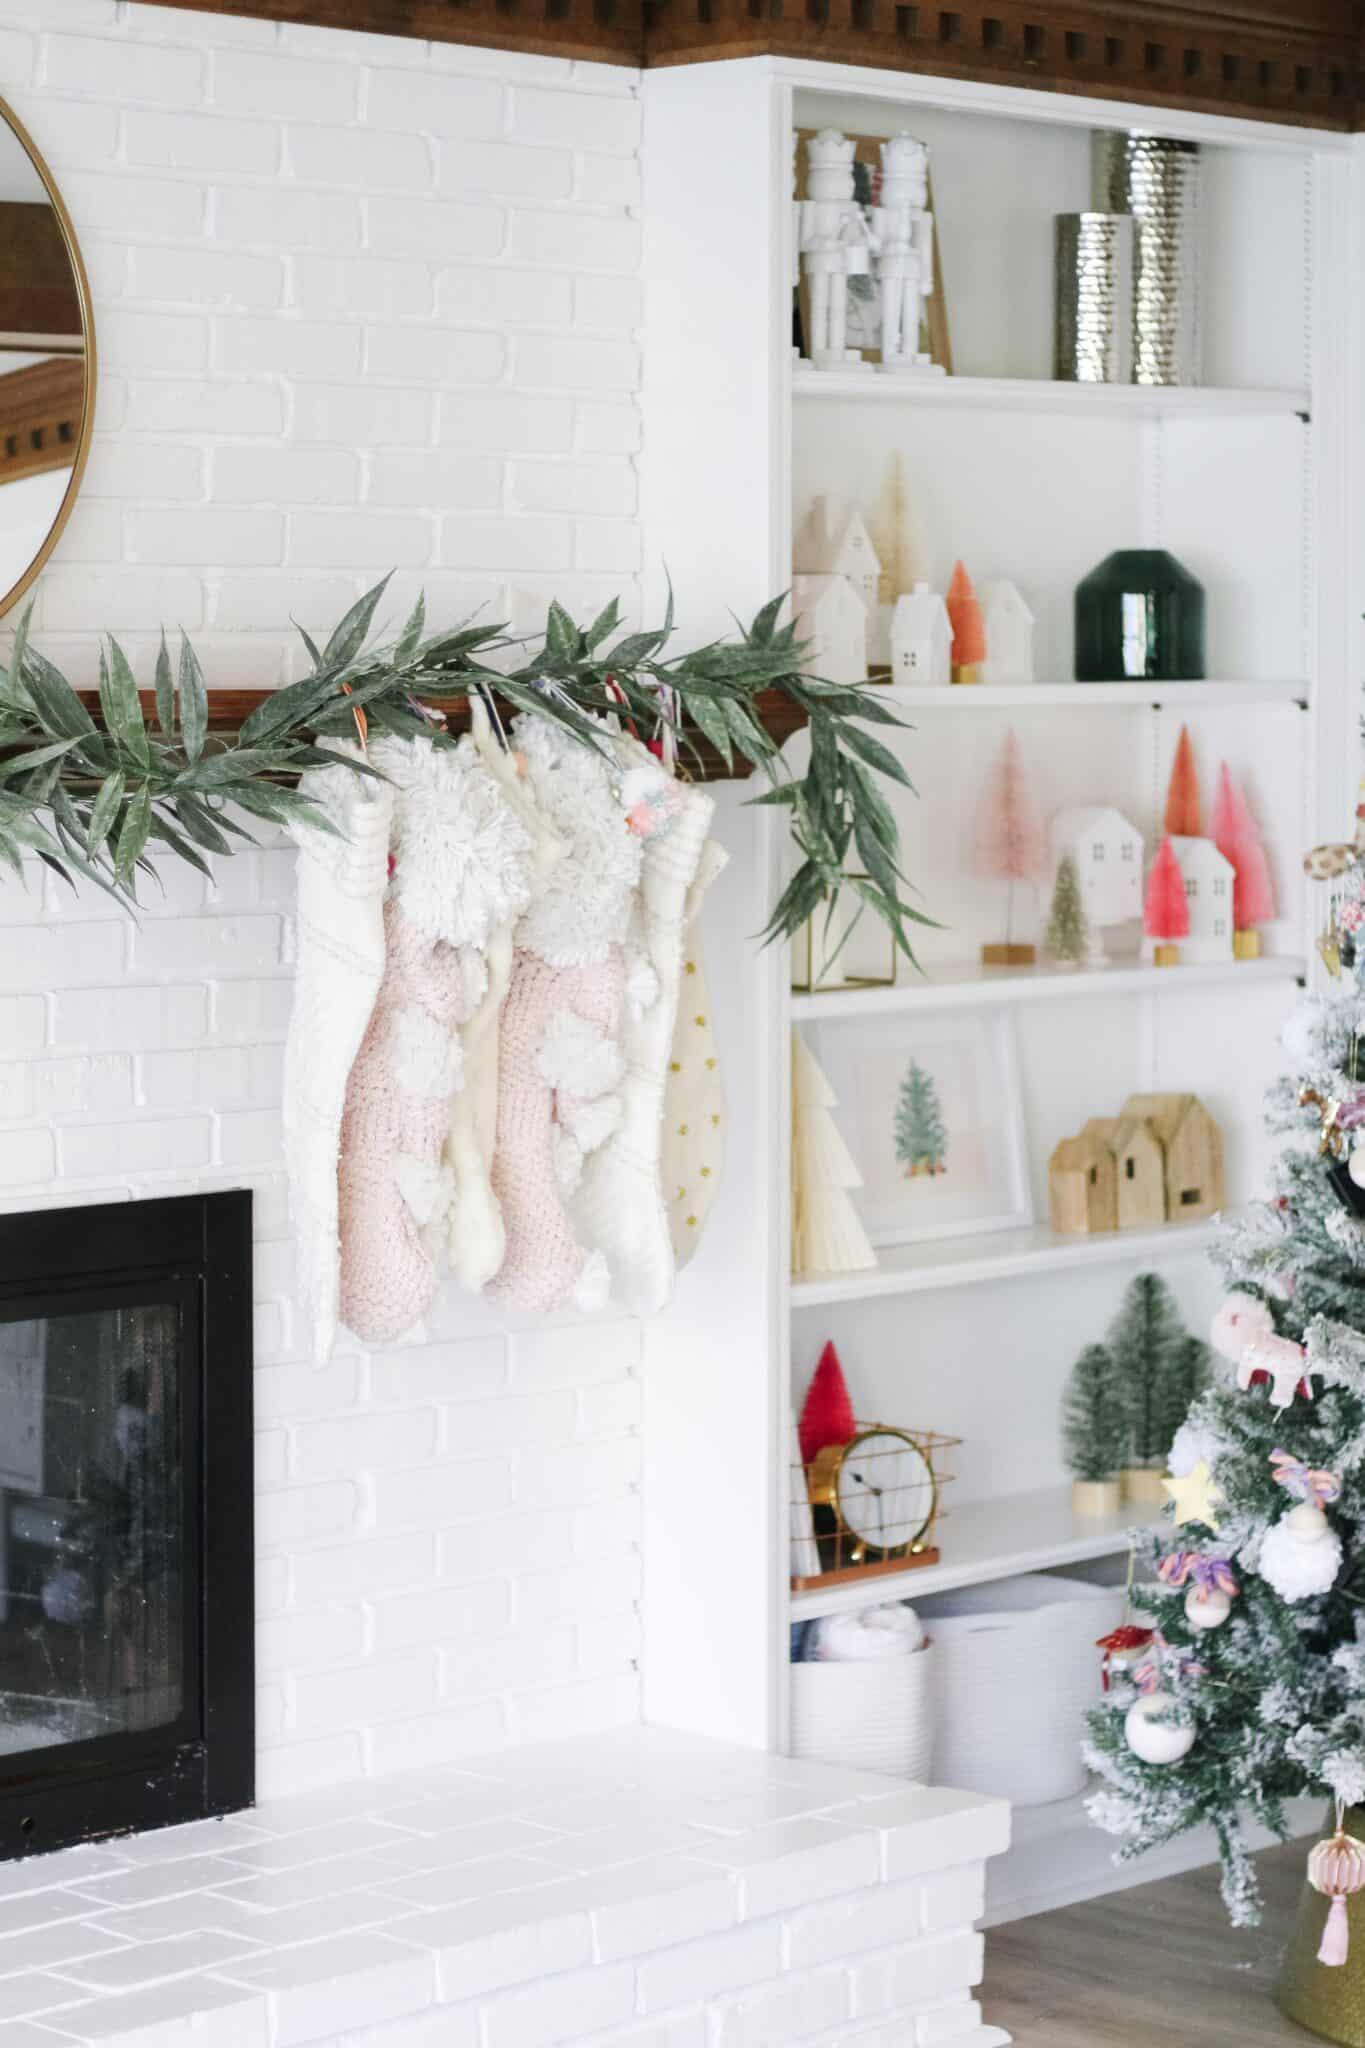 Anthropologie Stockings hanging on mantle